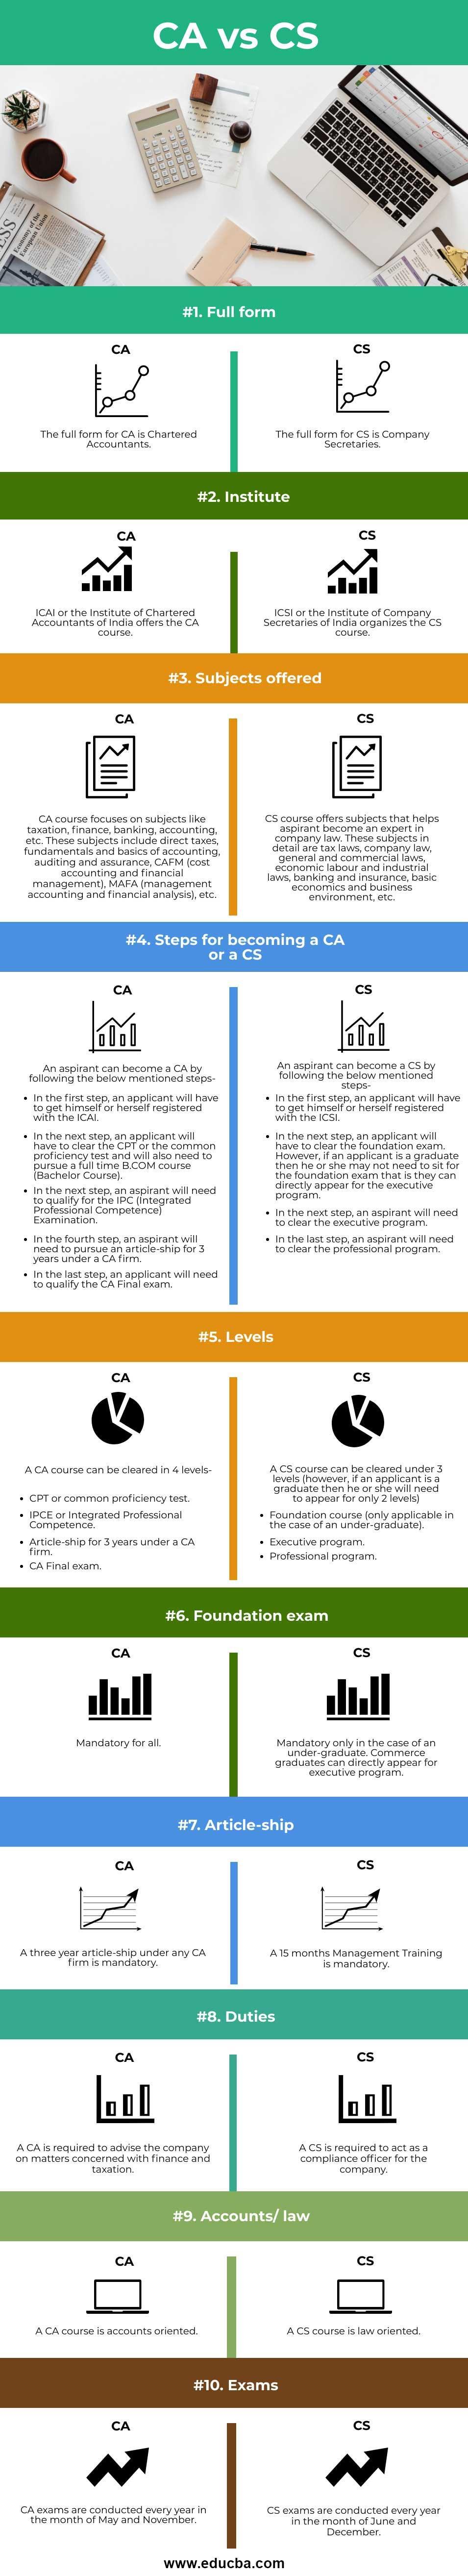 CA-vs-CS-info